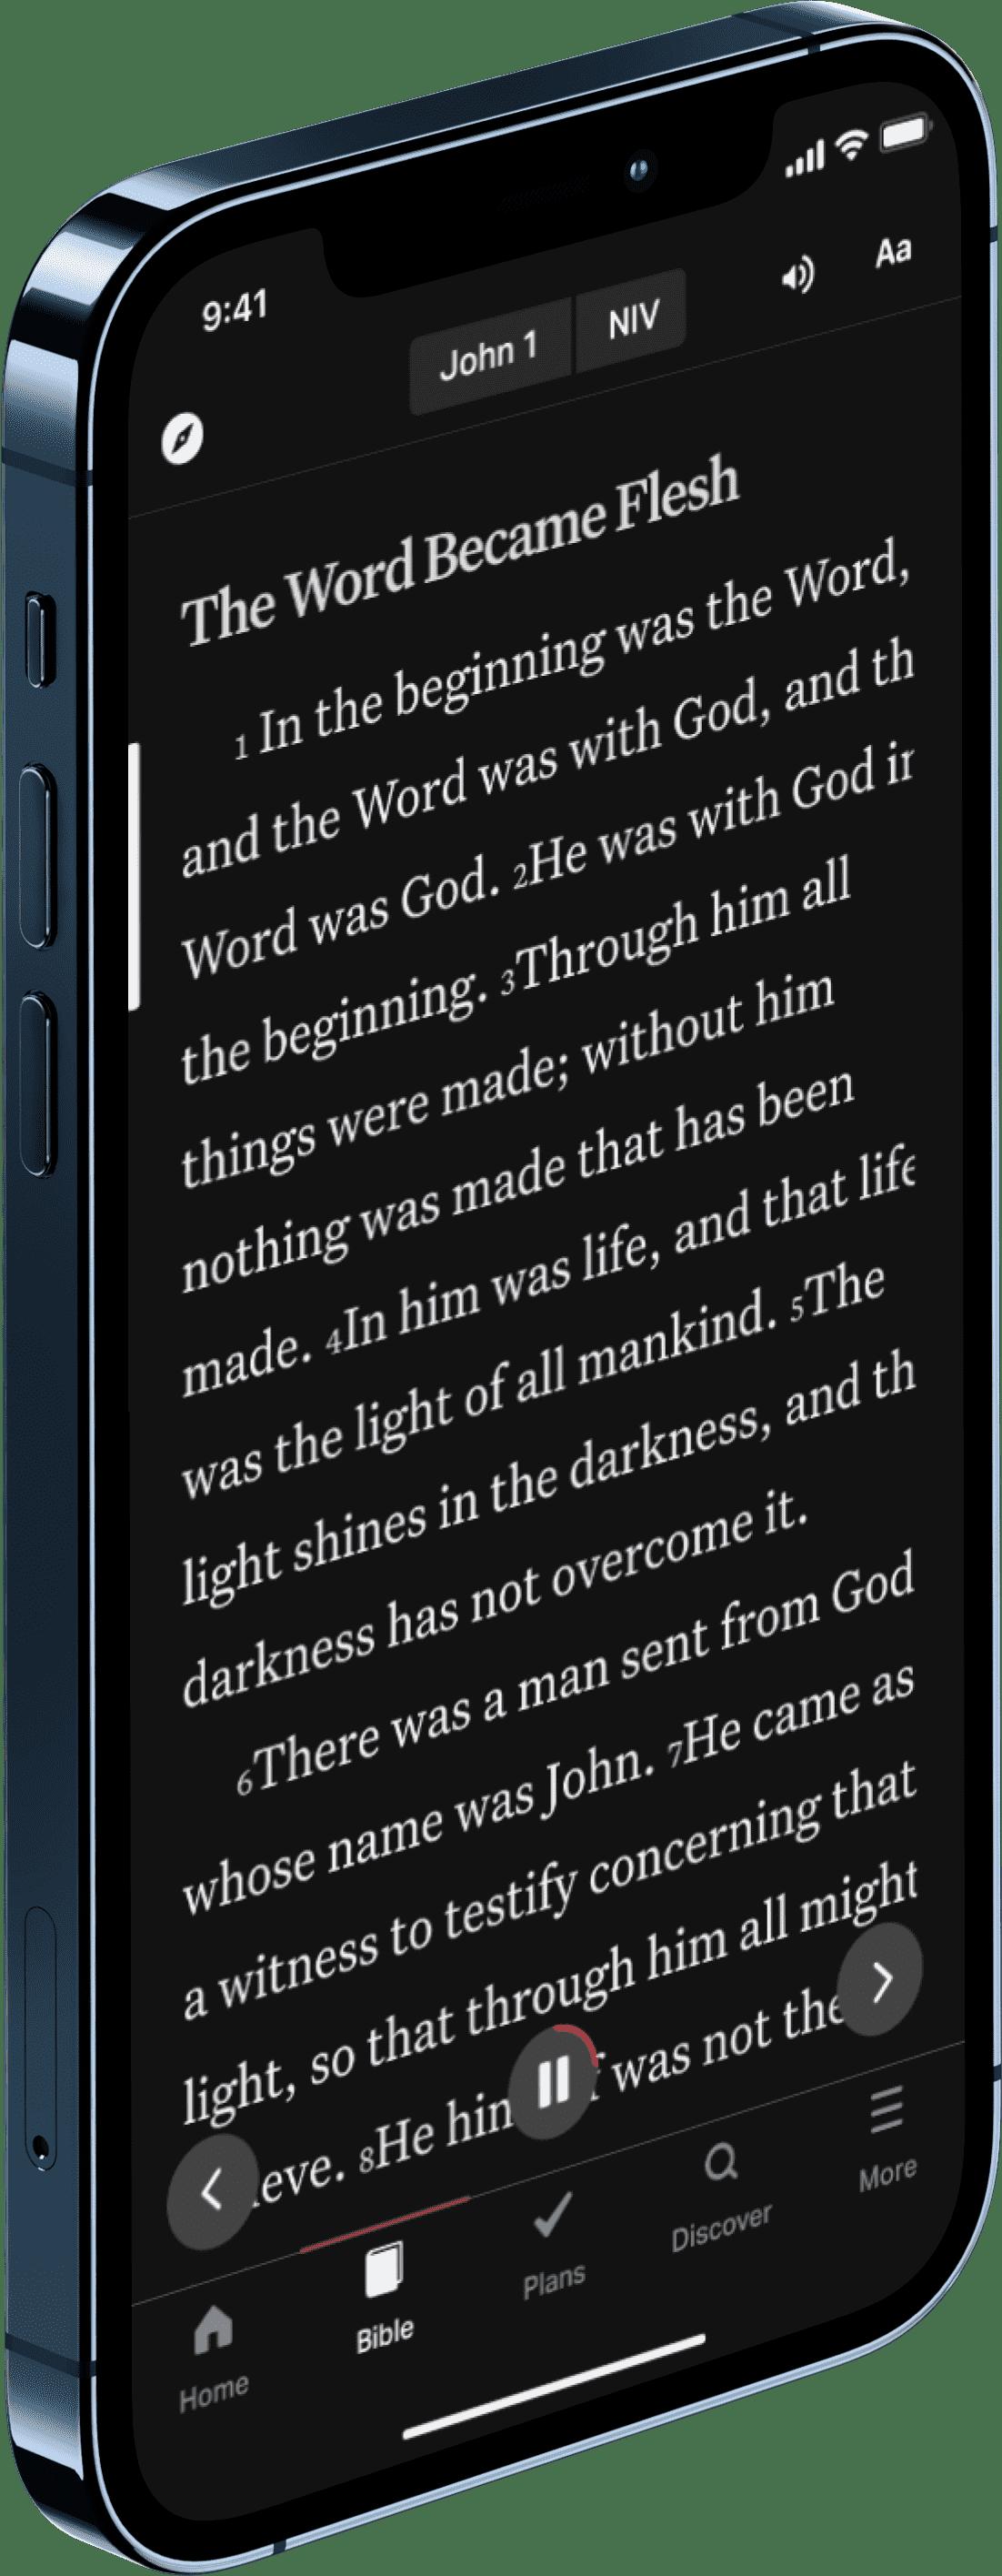 YouVersion Bible reader John 1